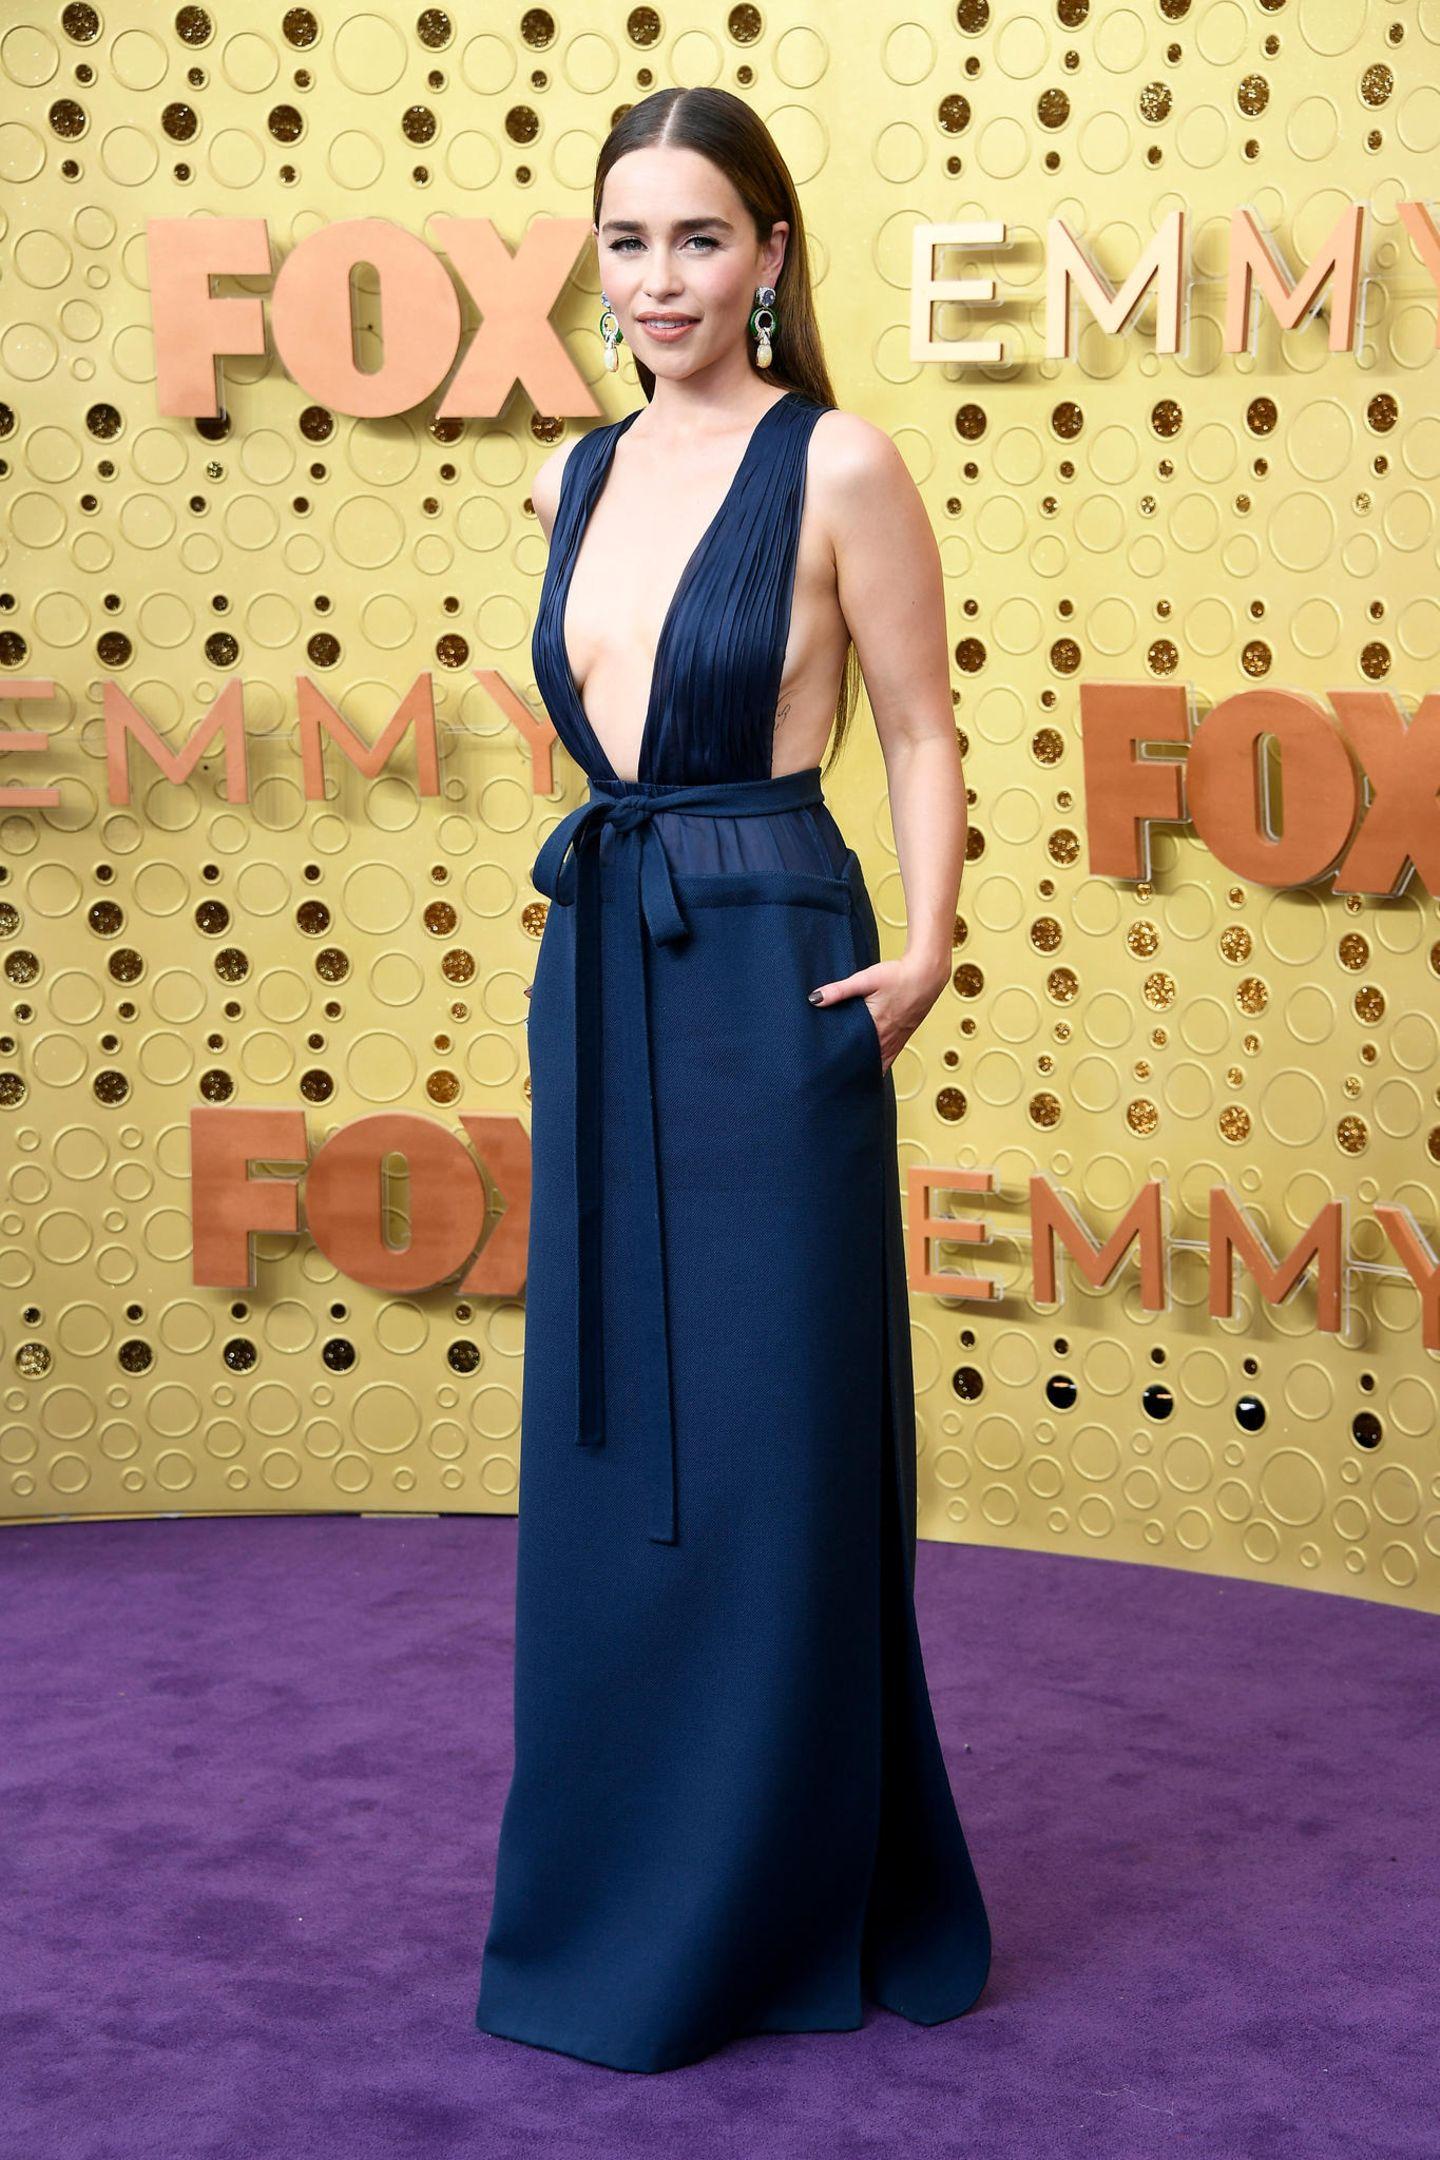 Aufgeschlossen: Emilia Clarke in Valentino Haute Couture